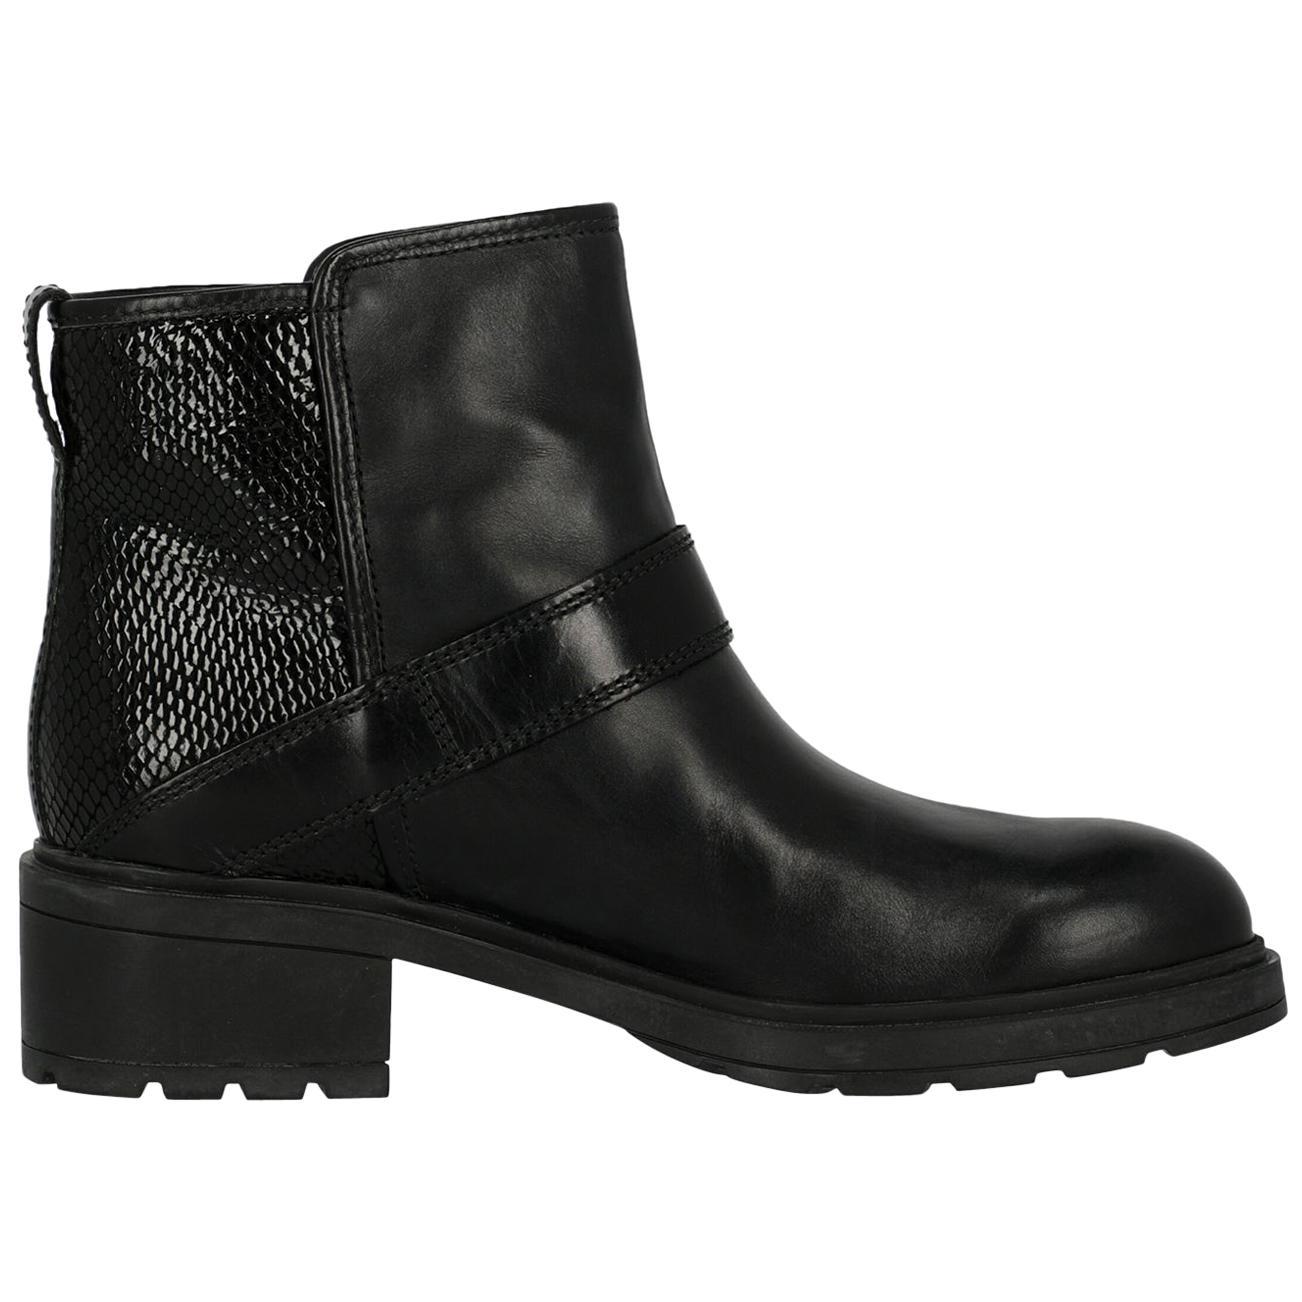 Hogan Woman Ankle boots Black Leather IT 36